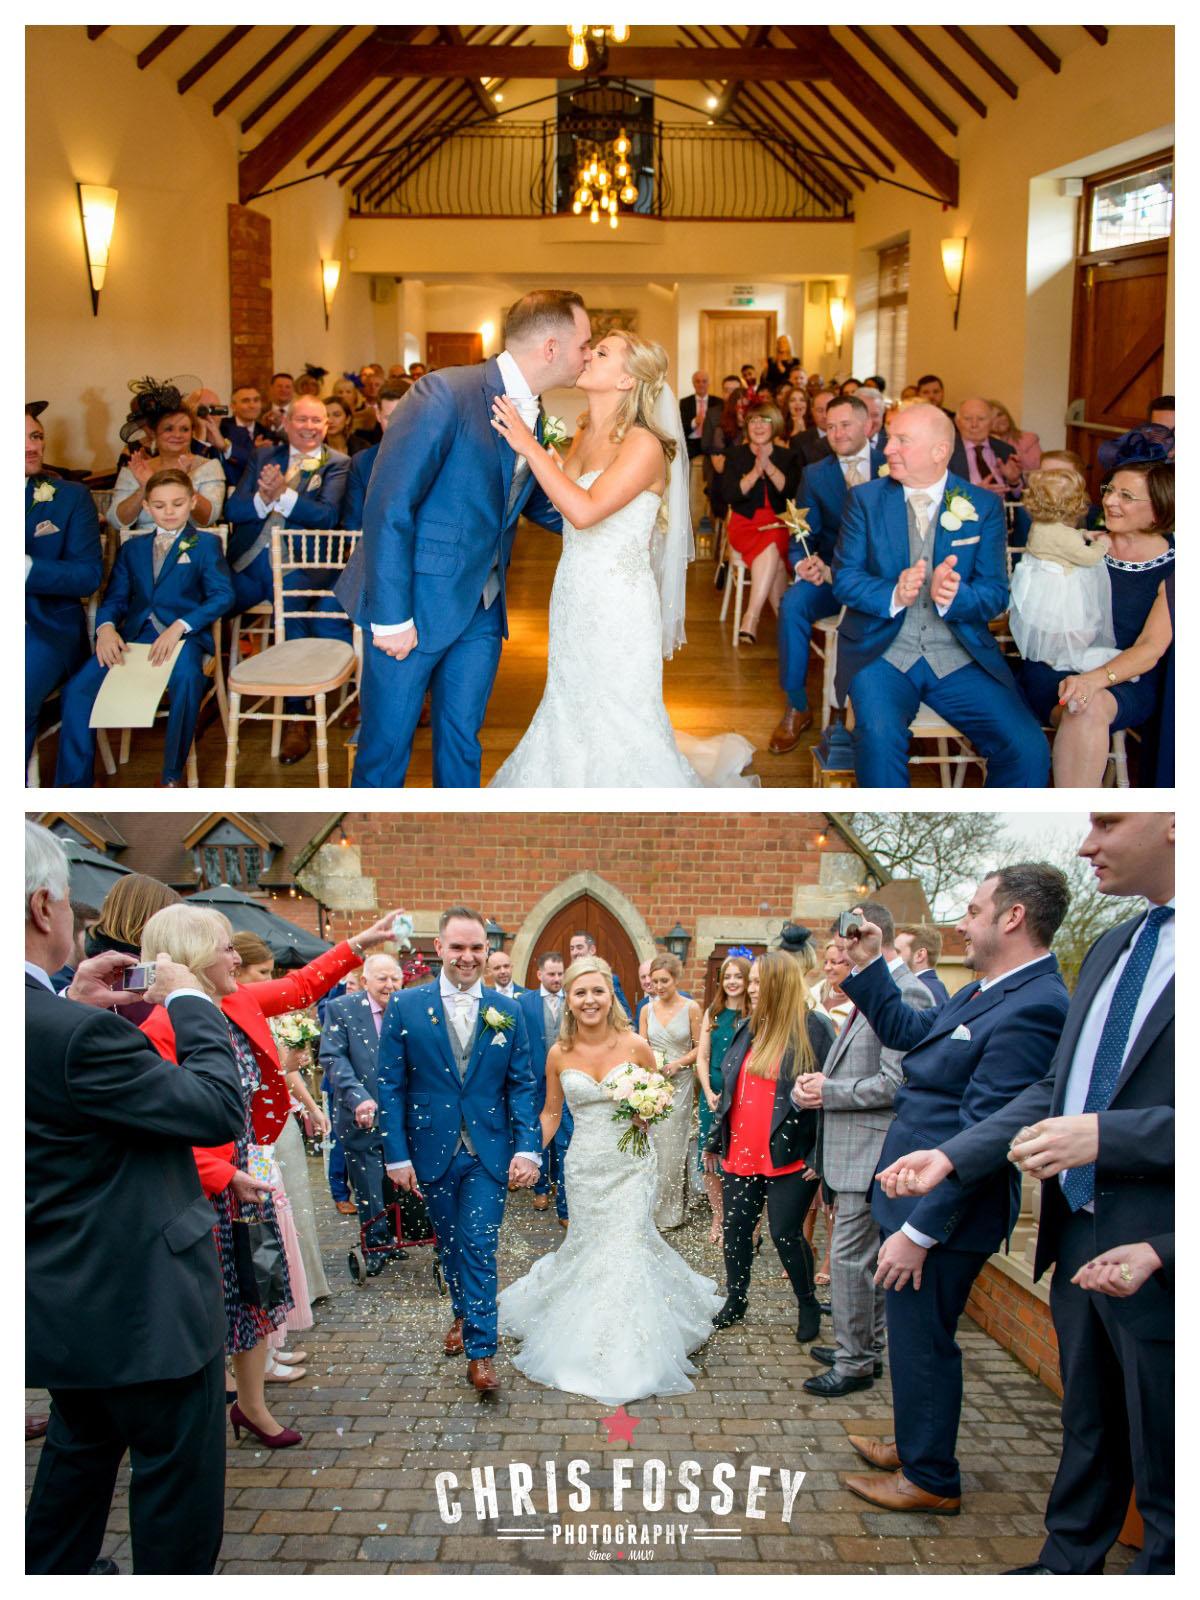 Nuthurst Grange Hotel Gorgeous Natural Wedding Photography Warwickshire Chris Fossey B94 5NL 08